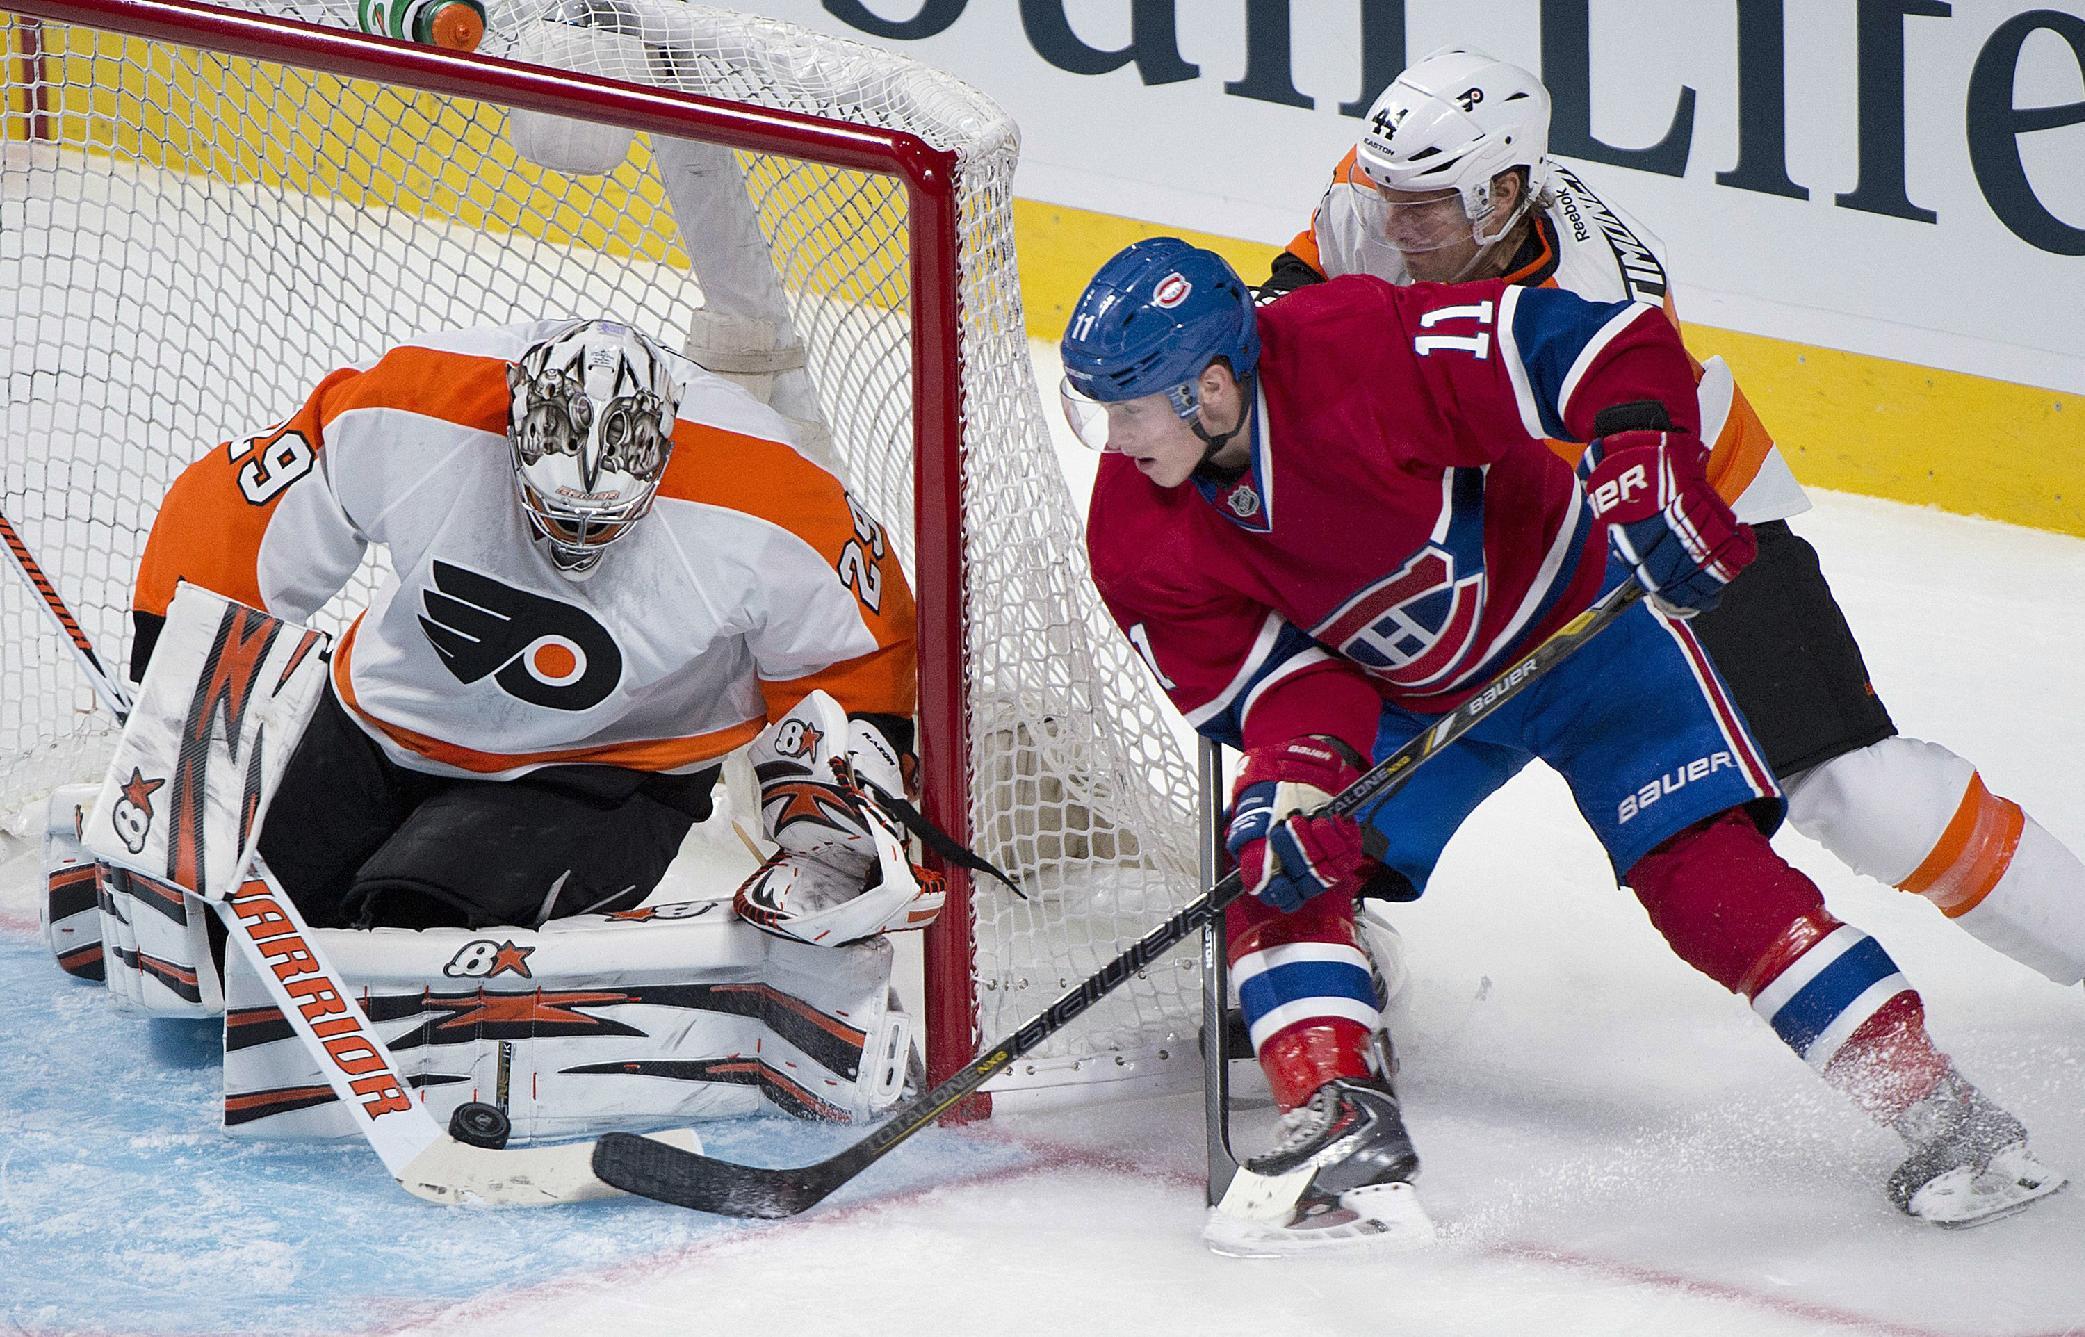 Lars Eller scores, Canadiens beat Flyers 4-1